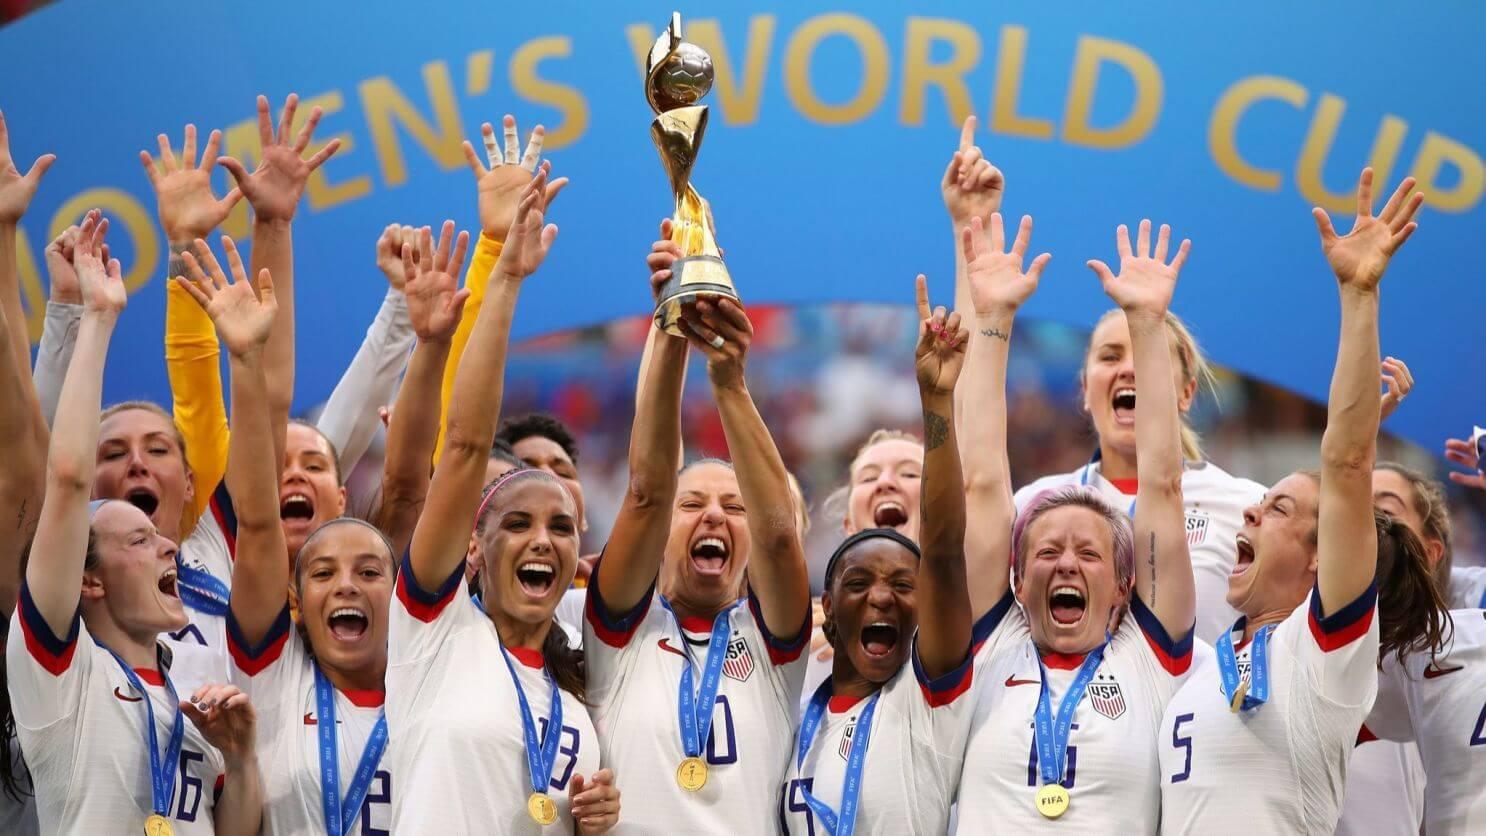 fifawomensworldcup2023tostartinaucklandandendinsydney